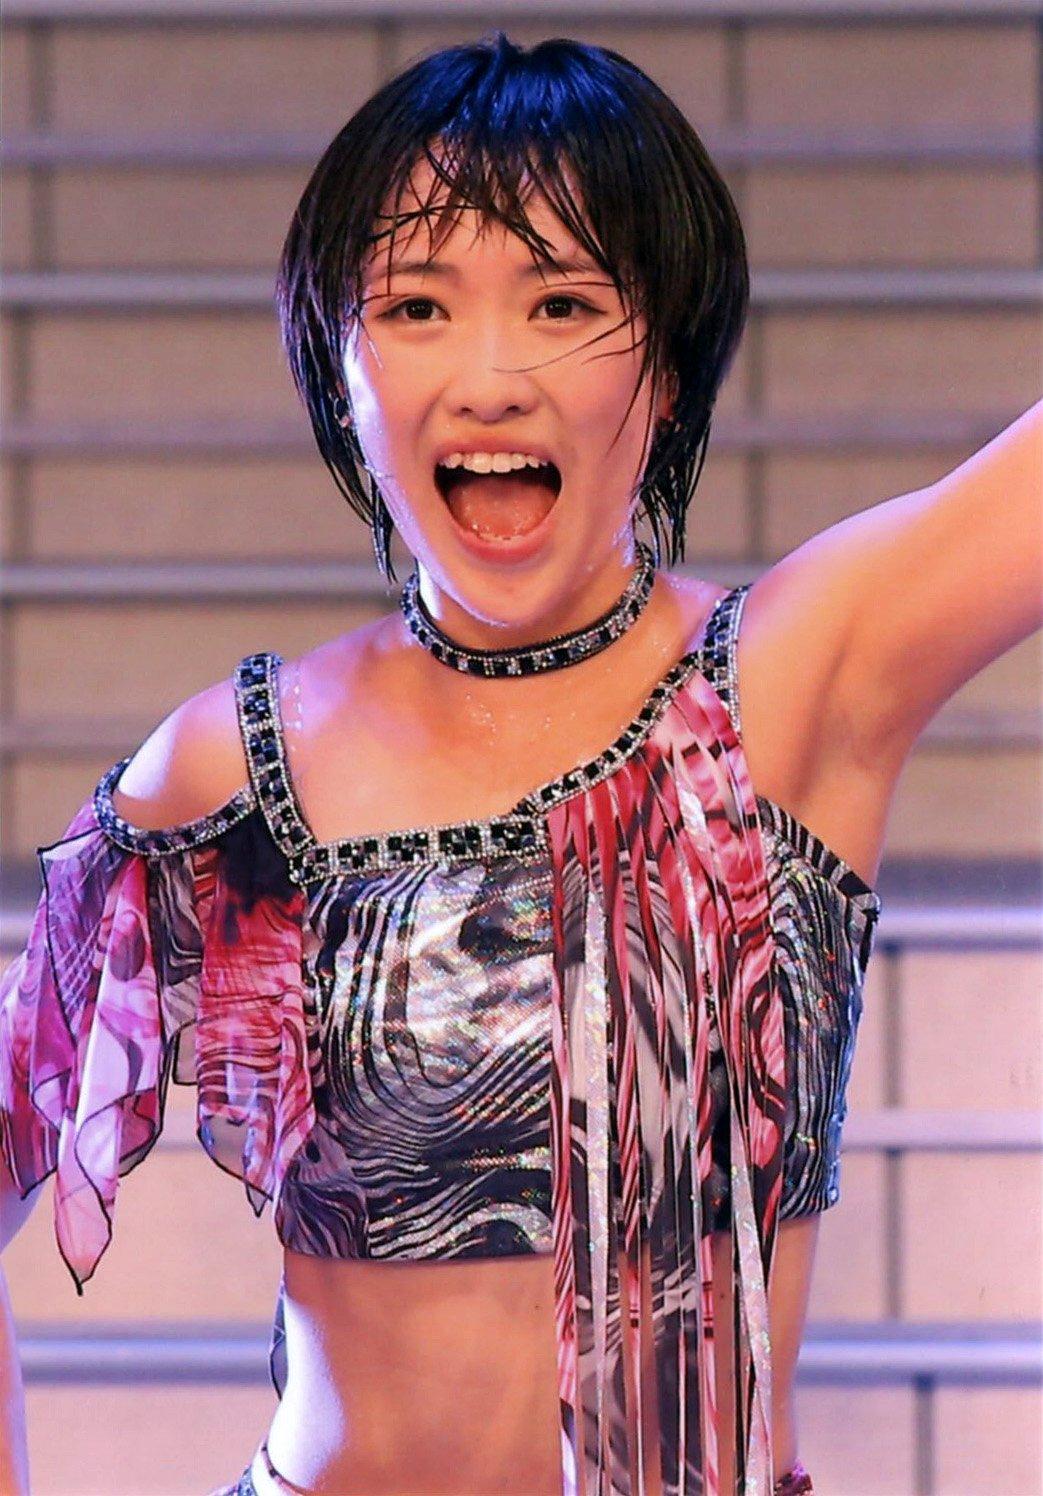 Concert, Kudo Haruka, Morning Musume